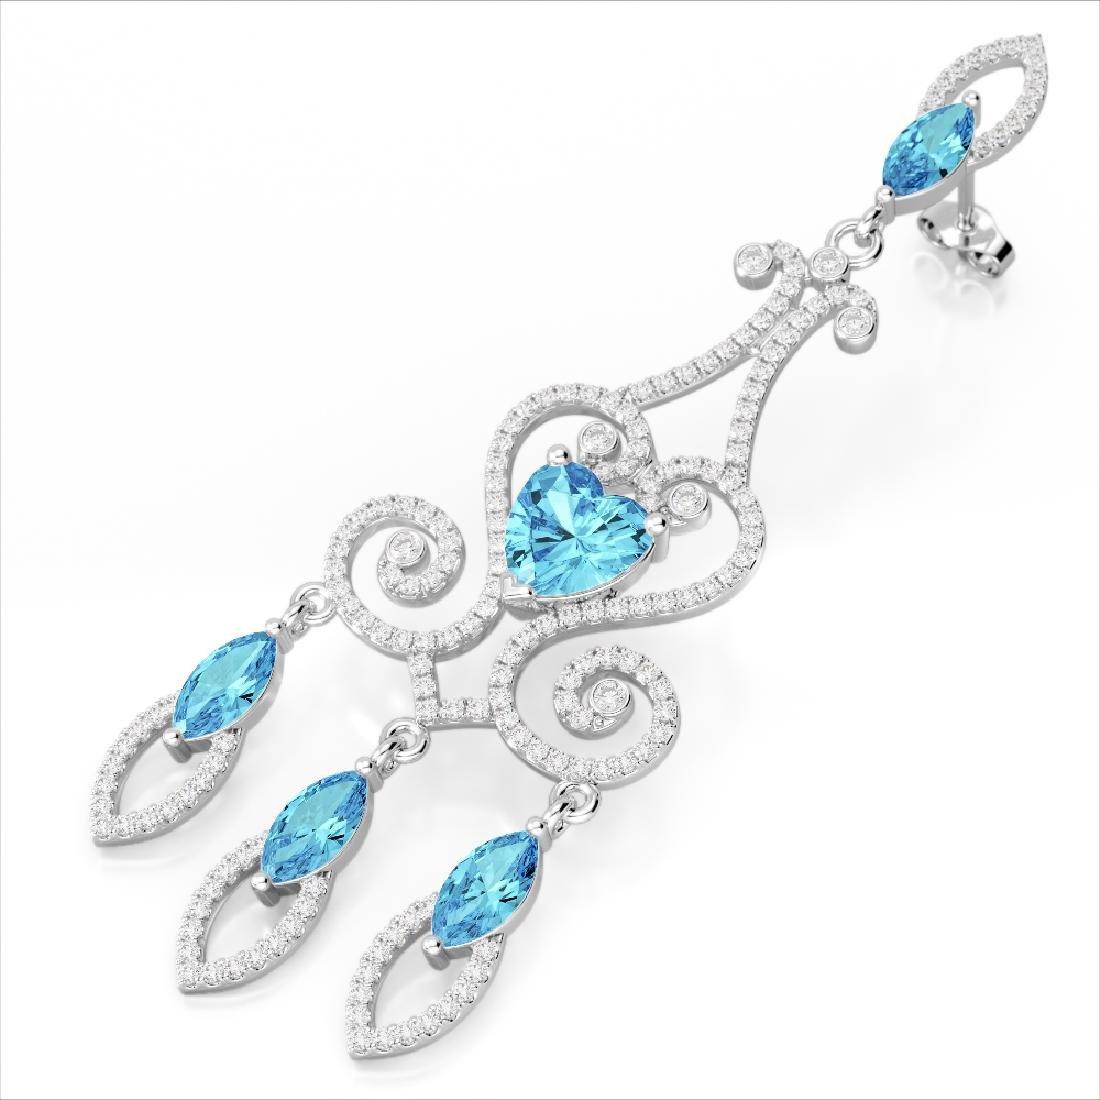 11 CTW Sky Topaz & Micro Pave VS/SI Diamond Earrings